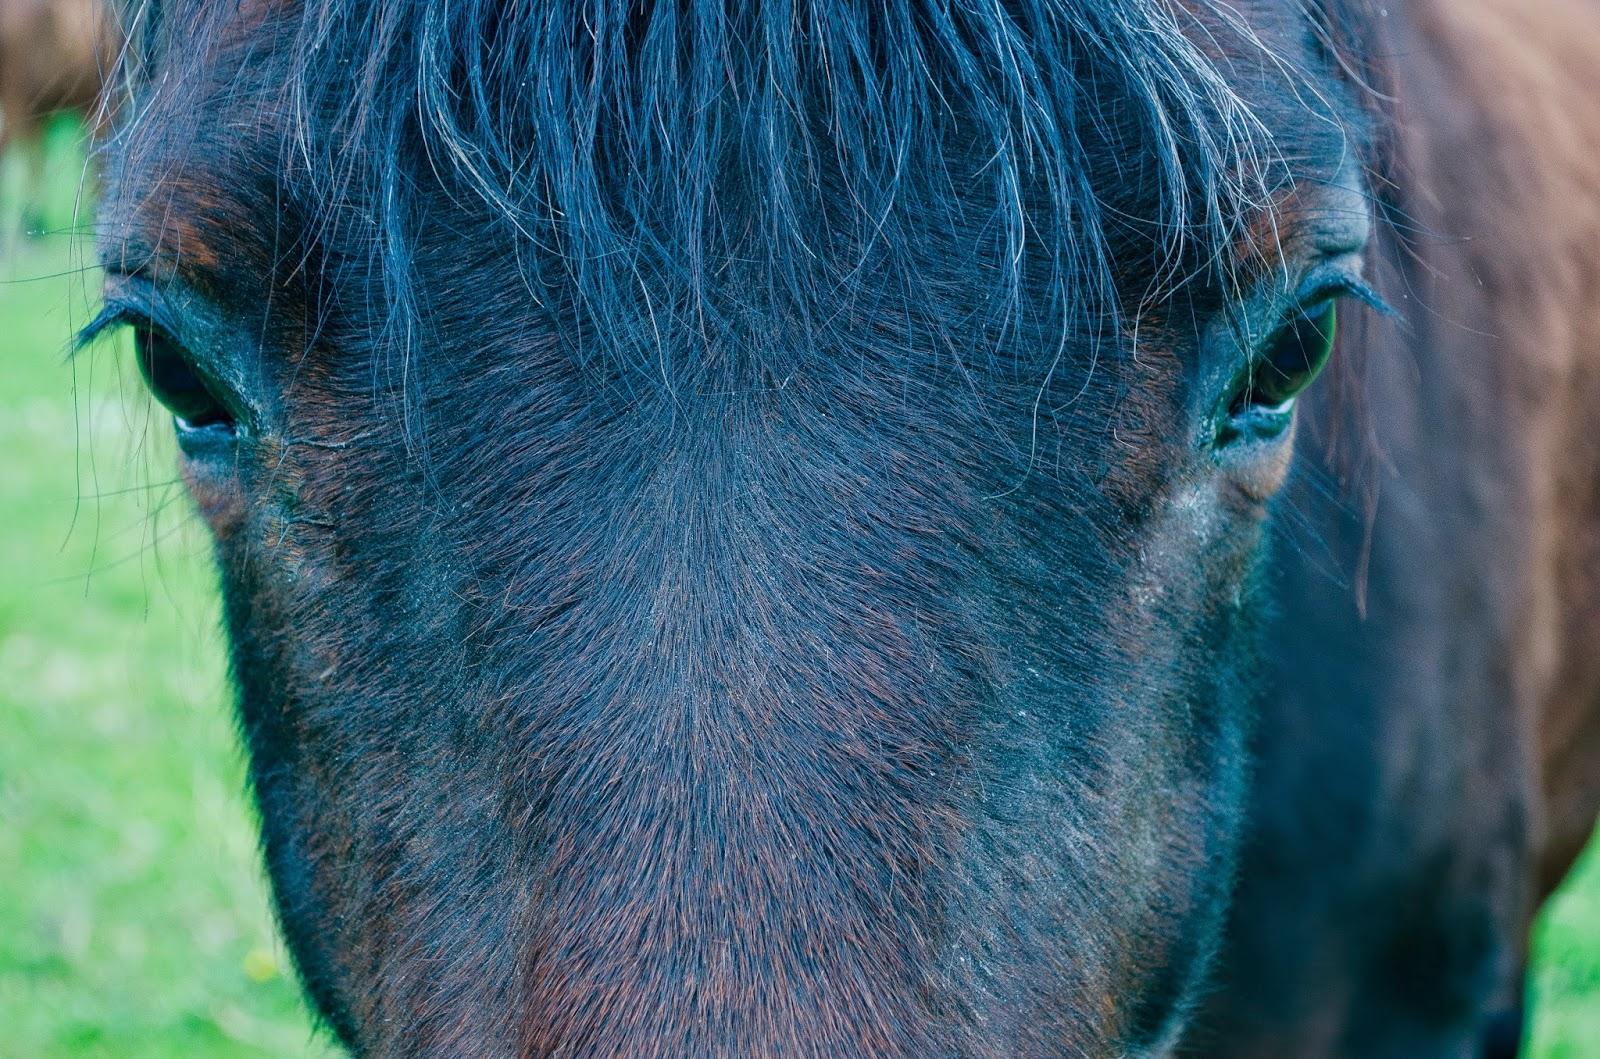 aesthetic fauna // equine